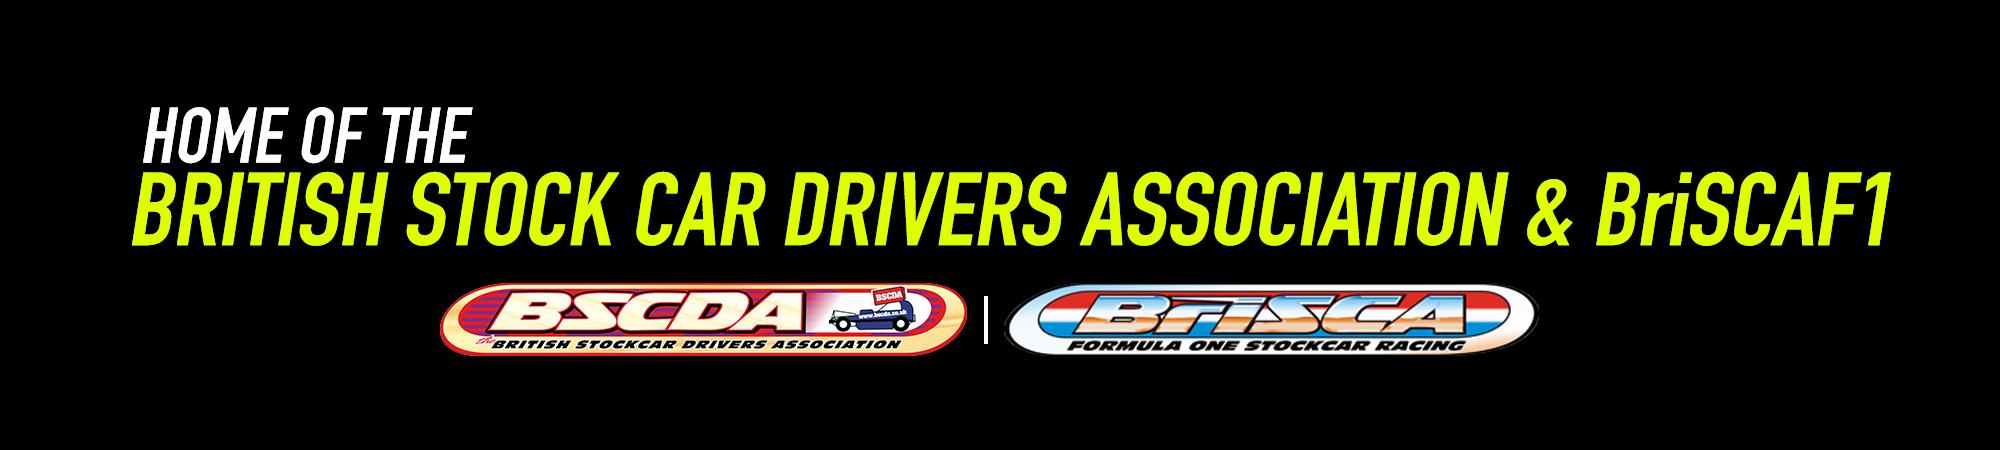 British Stock Car Drivers Association